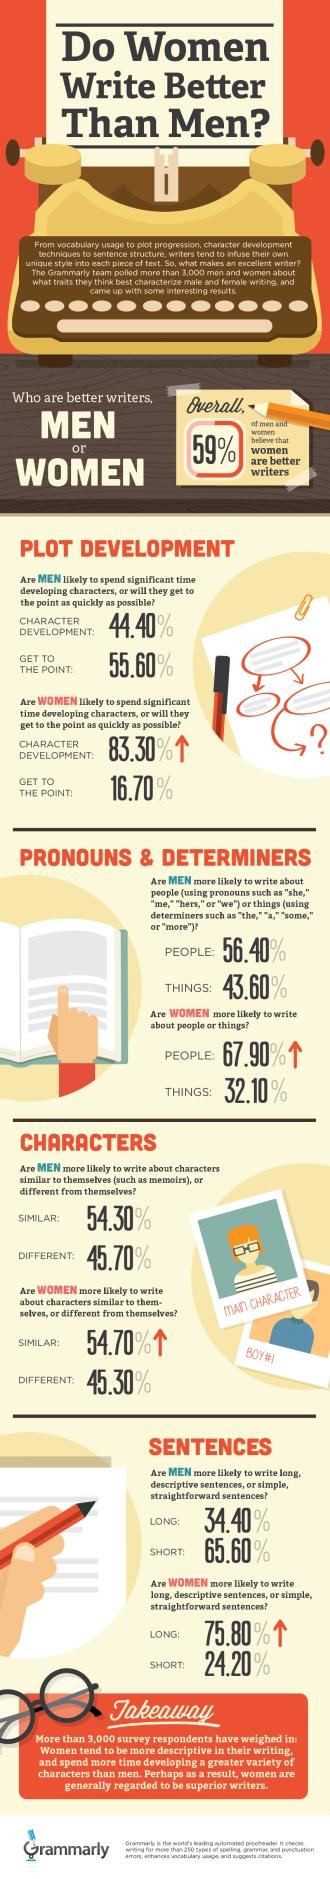 MenvsWomen_Writers_infographic (2)